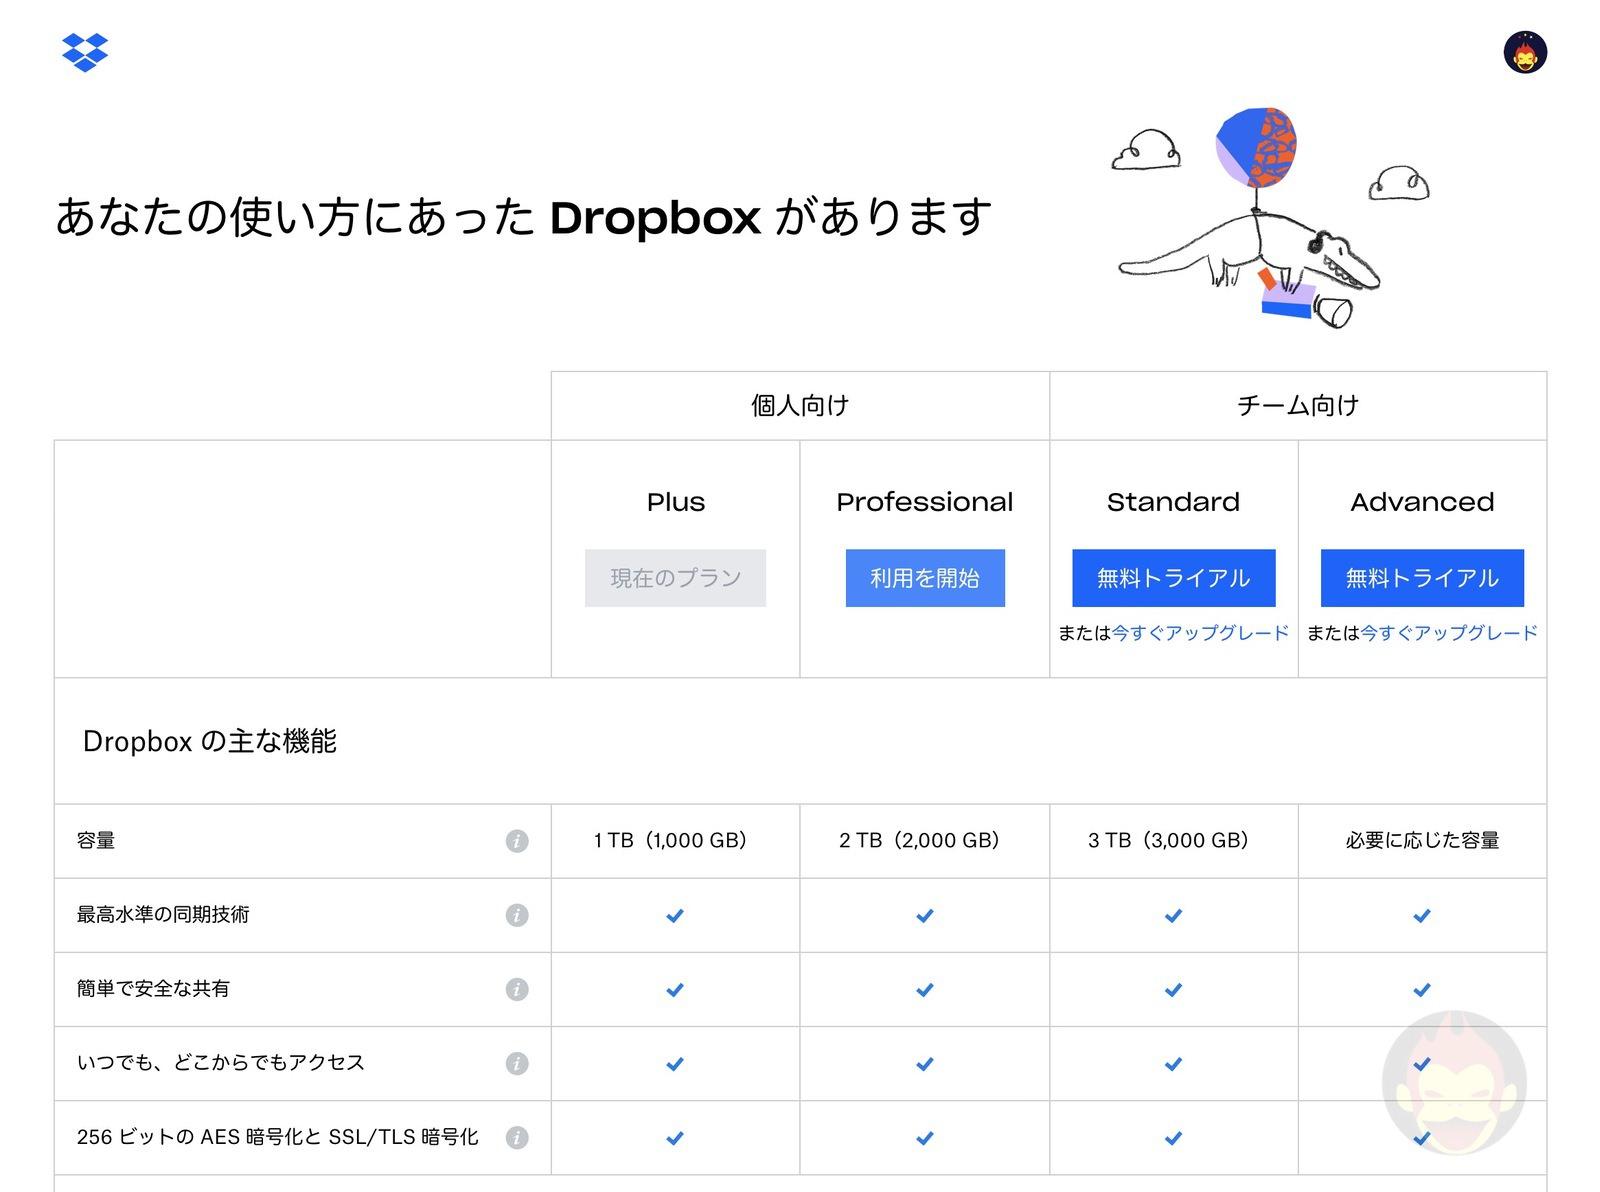 Dropbox Professional Smart Sync 05